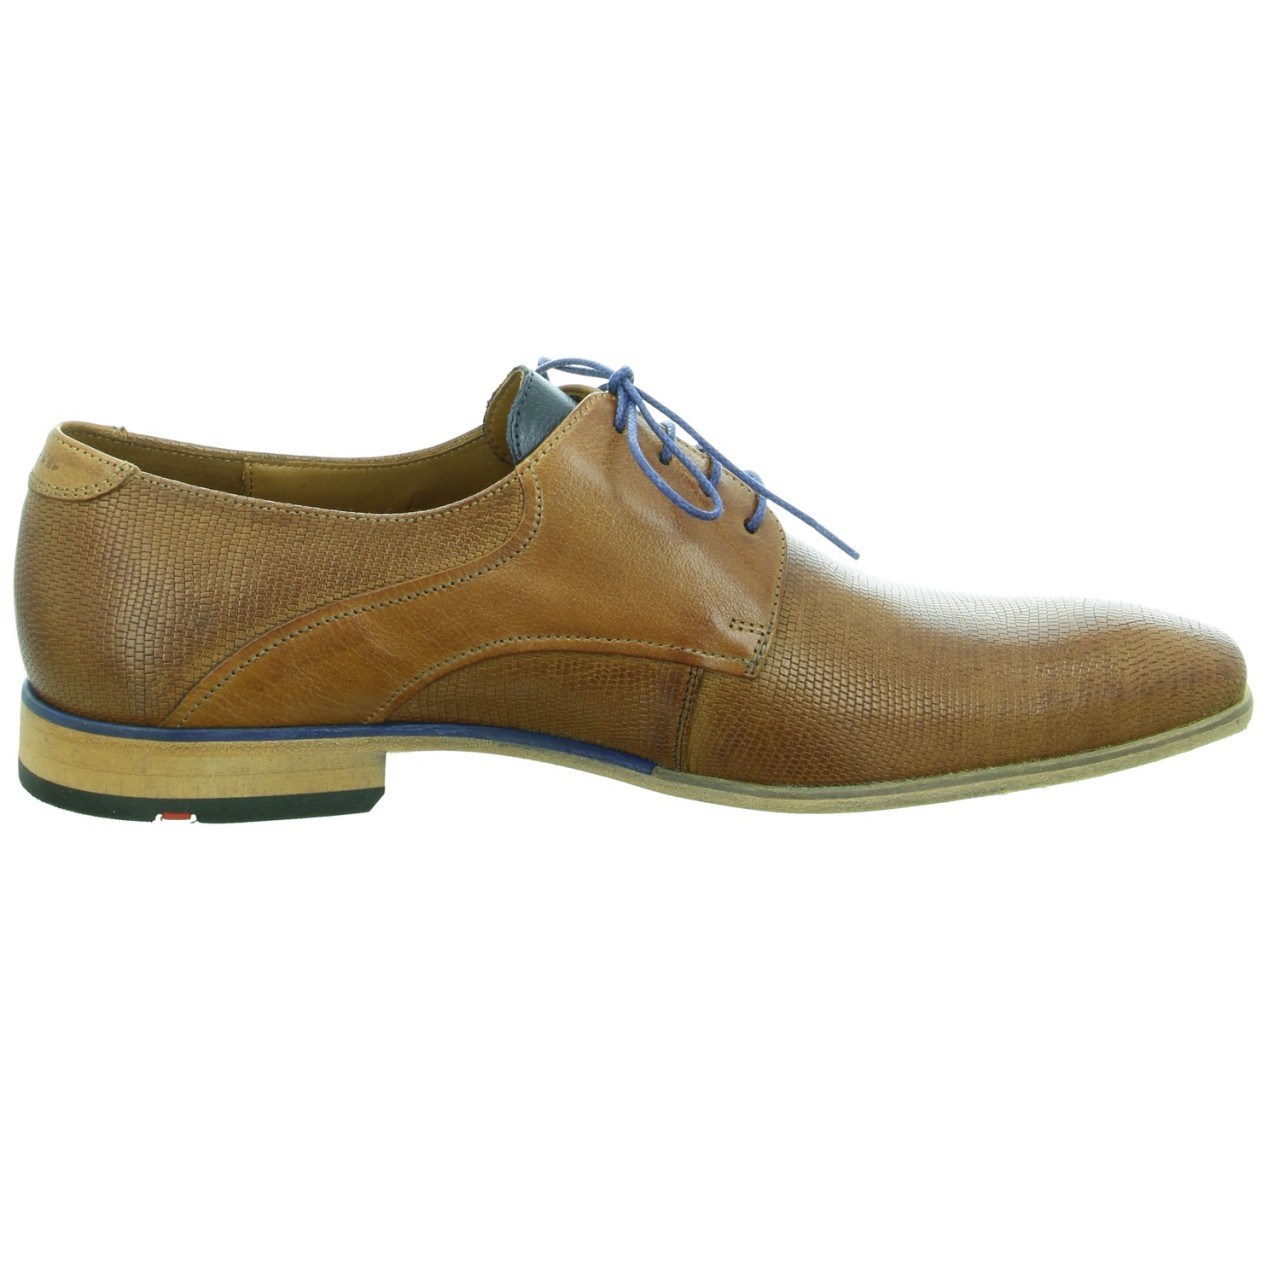 braun Business 114 Schuhe 53 Lloyd Lloyd 17 braun Business qF84E4